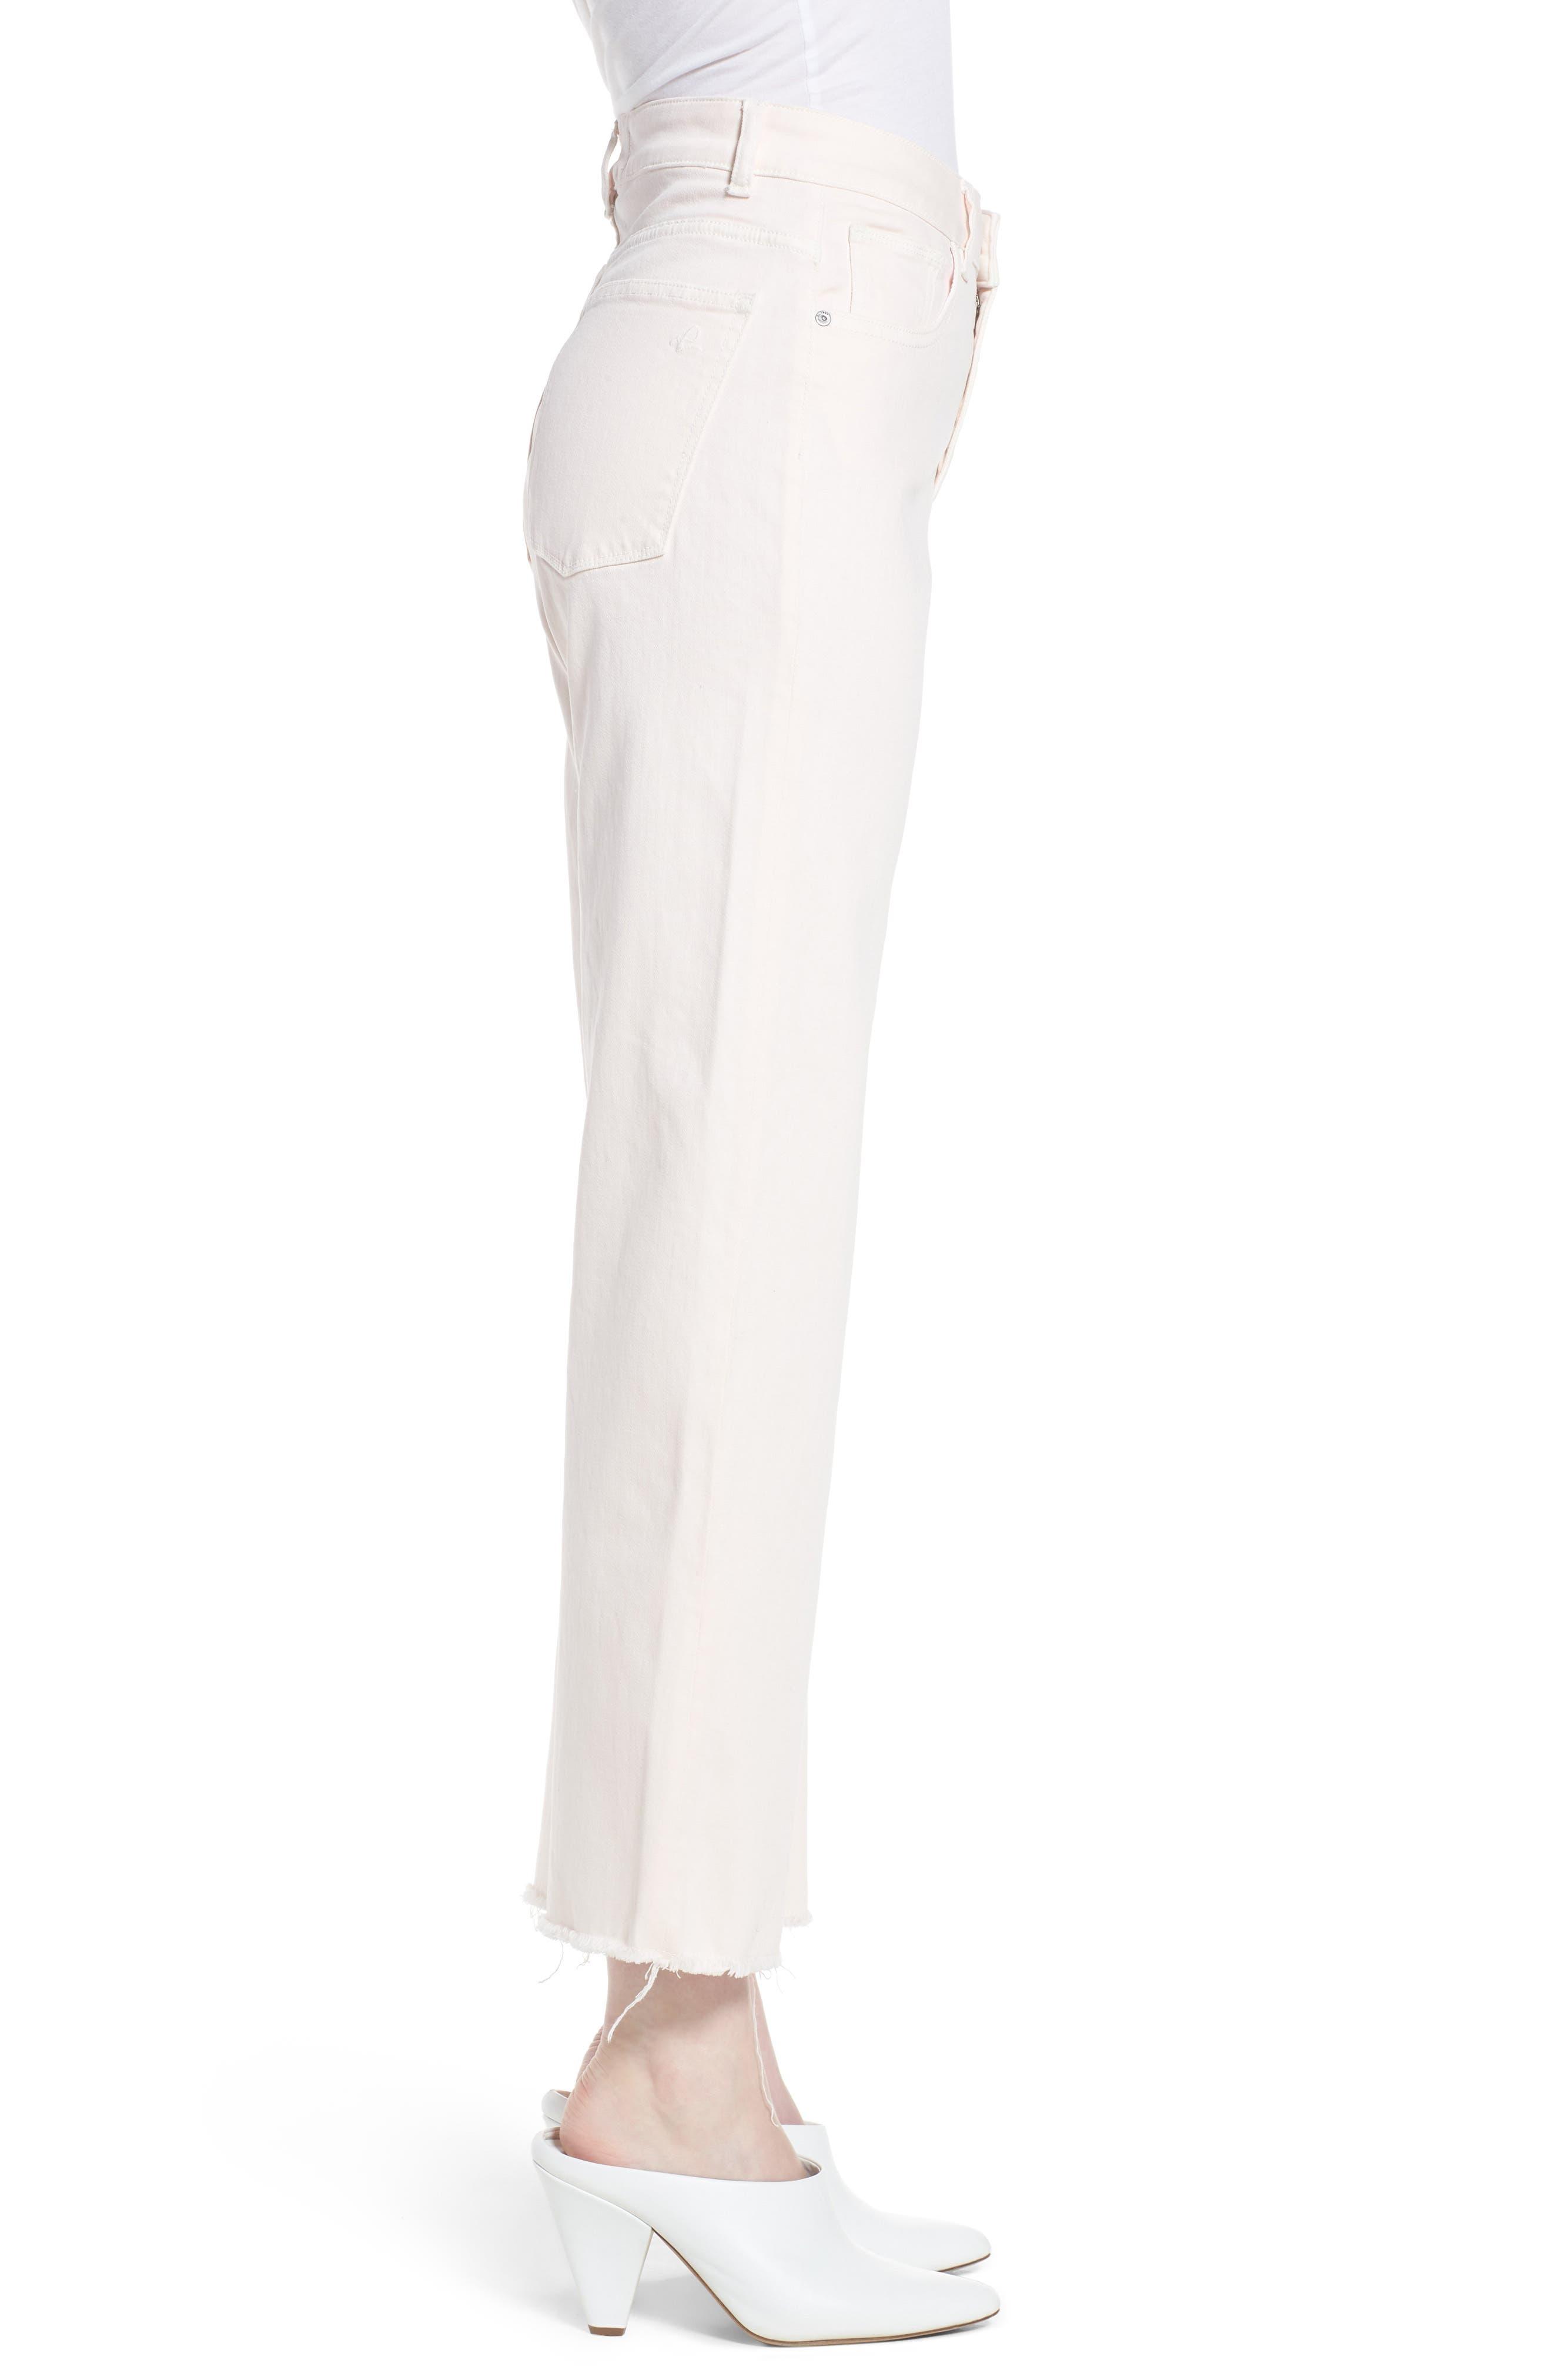 Hepburn Ankle Wide Leg Jeans,                             Alternate thumbnail 3, color,                             Blush Pink